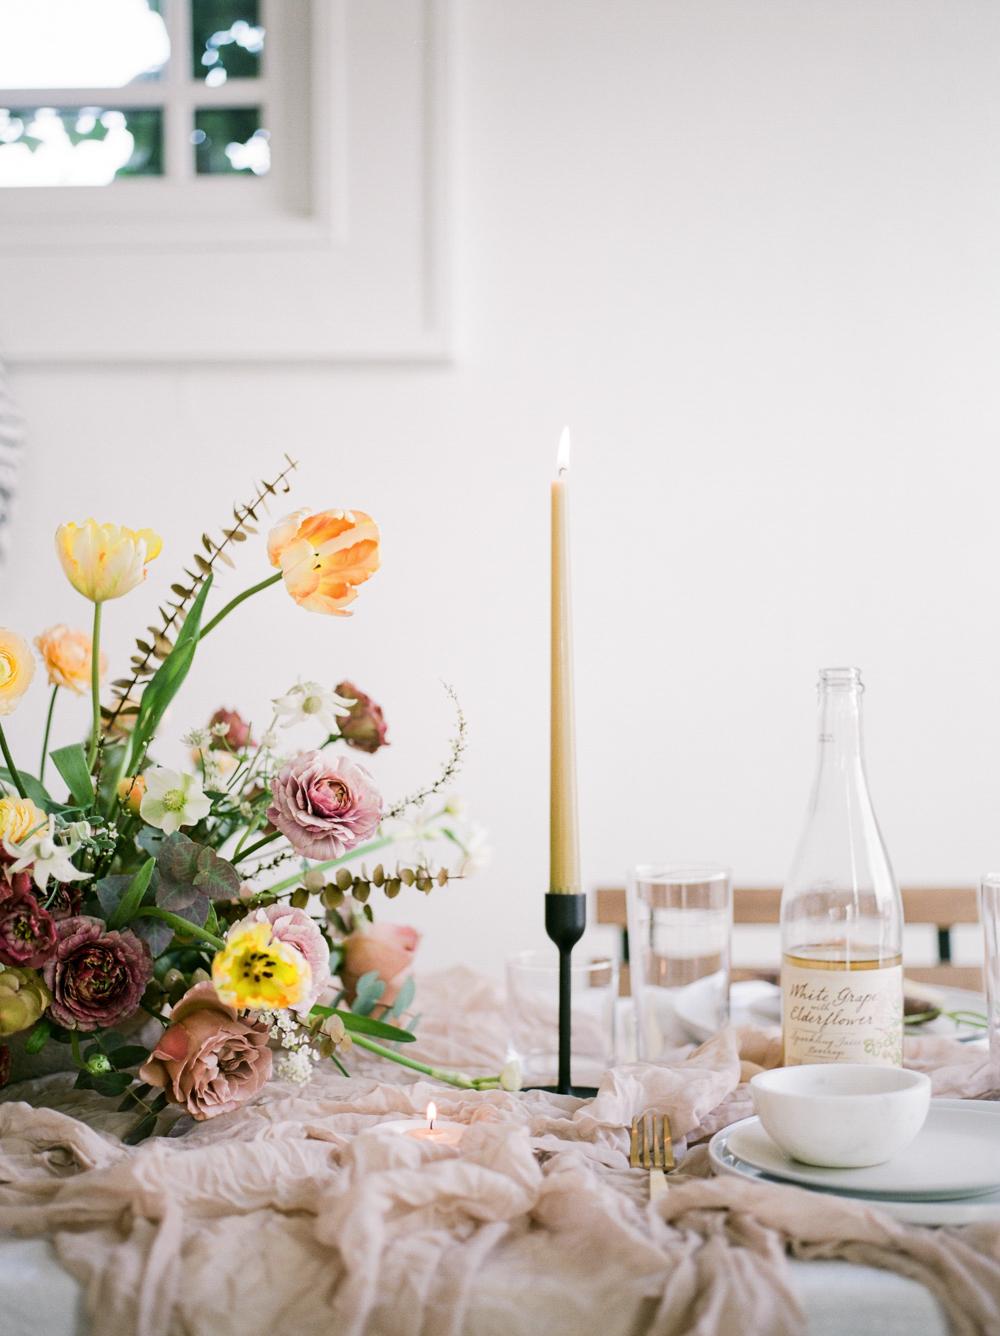 Christine Gosch - destination film photographer - houston wedding photographer - fine art film photographer - elopement photographer - destination wedding - understated wedding - simple beautiful wedding photography-25.jpg